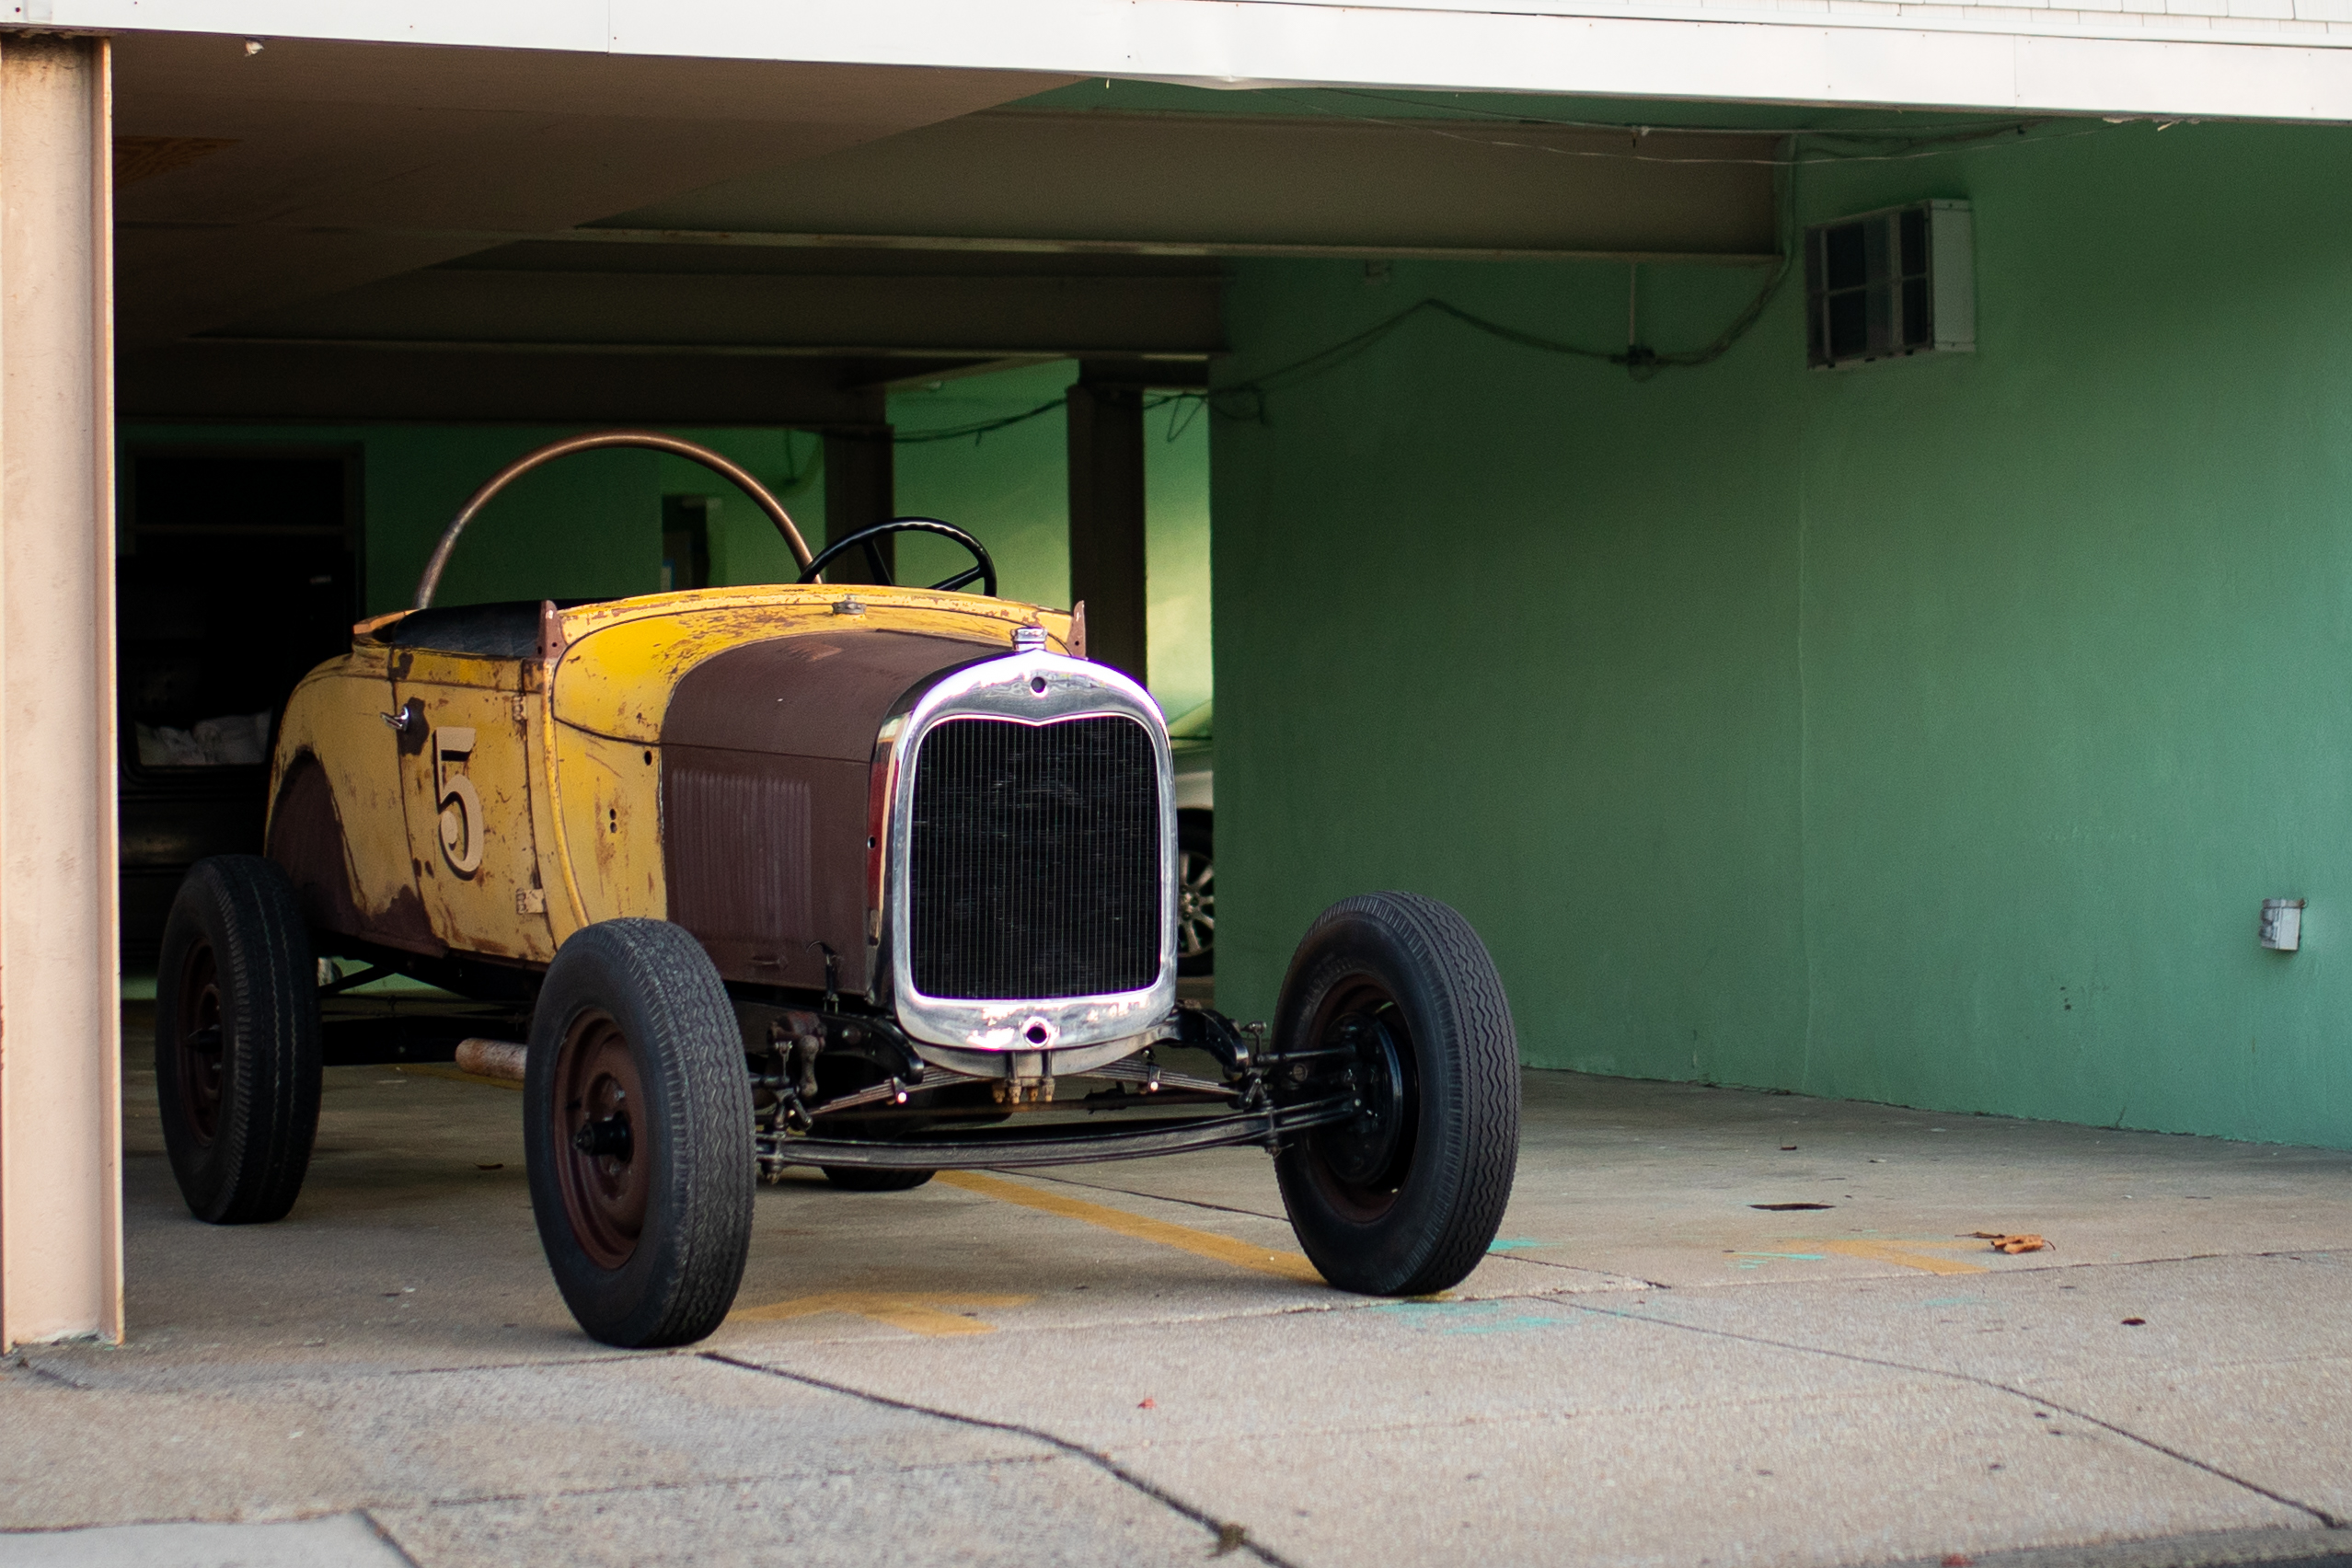 hot rod racer in garage